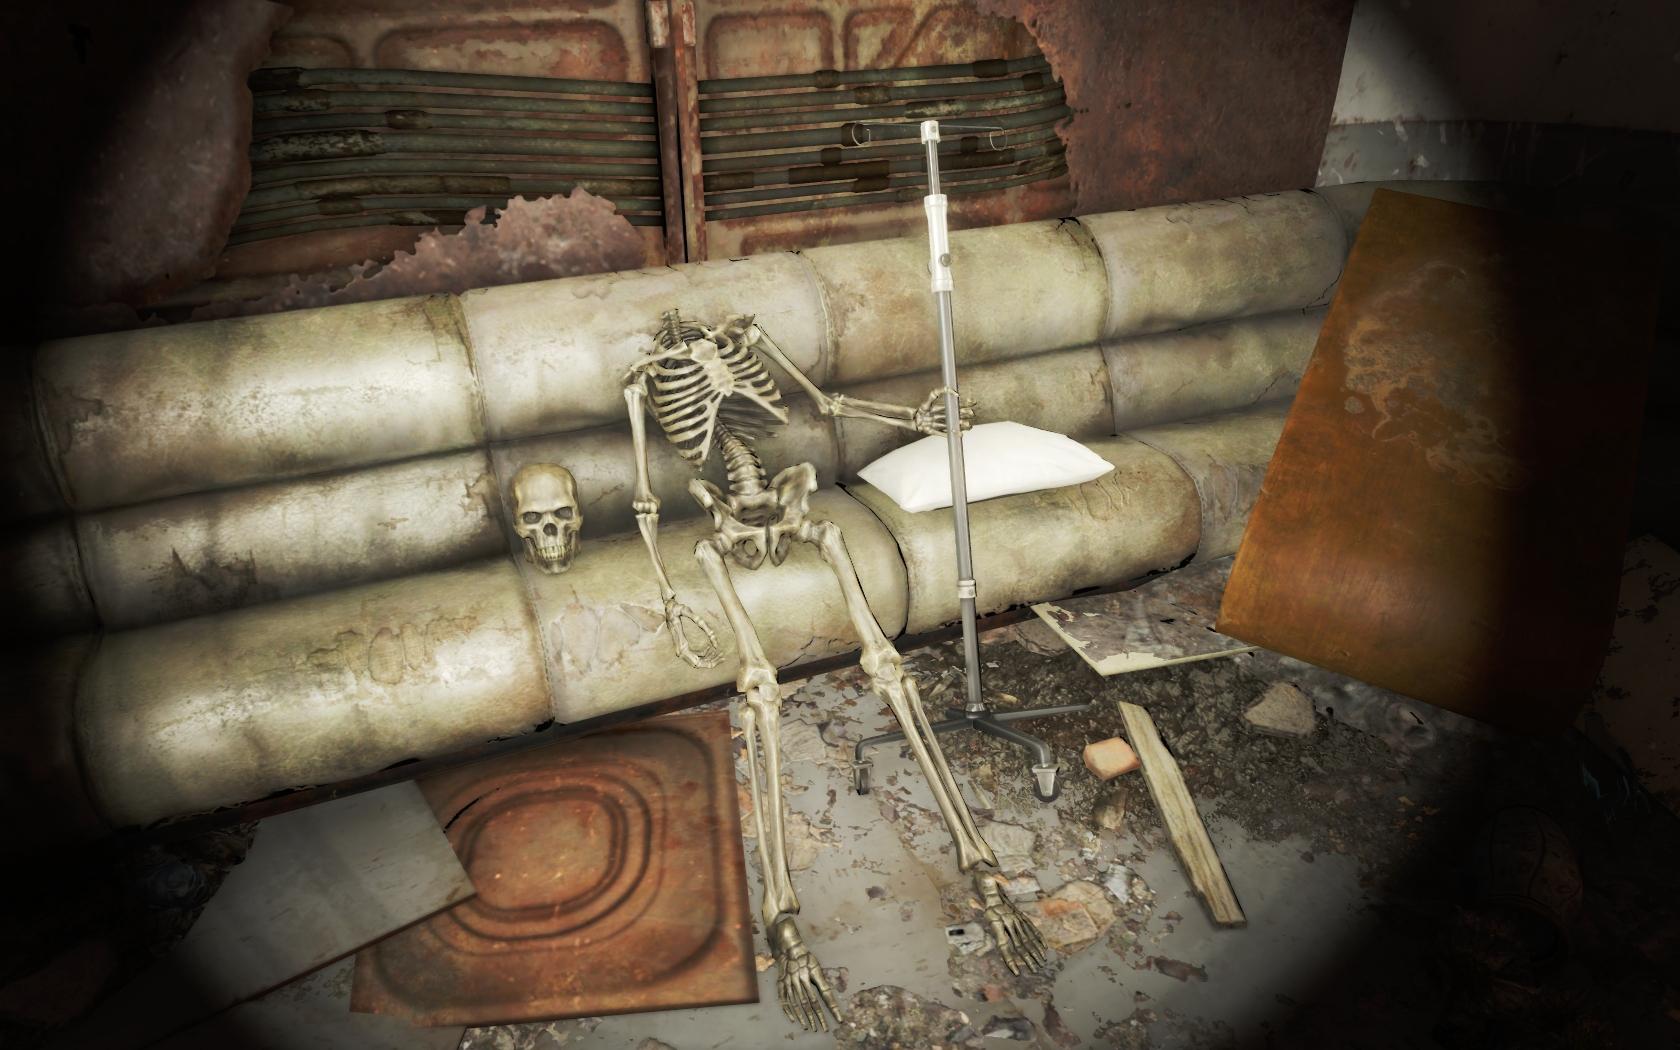 Голову лечит (Медцентр Массачусетс-Бэй) - Fallout 4 Массачусетс-Бэй, Медцентр, Медцентр Массачусетс-Бэй, скелет, Юмор